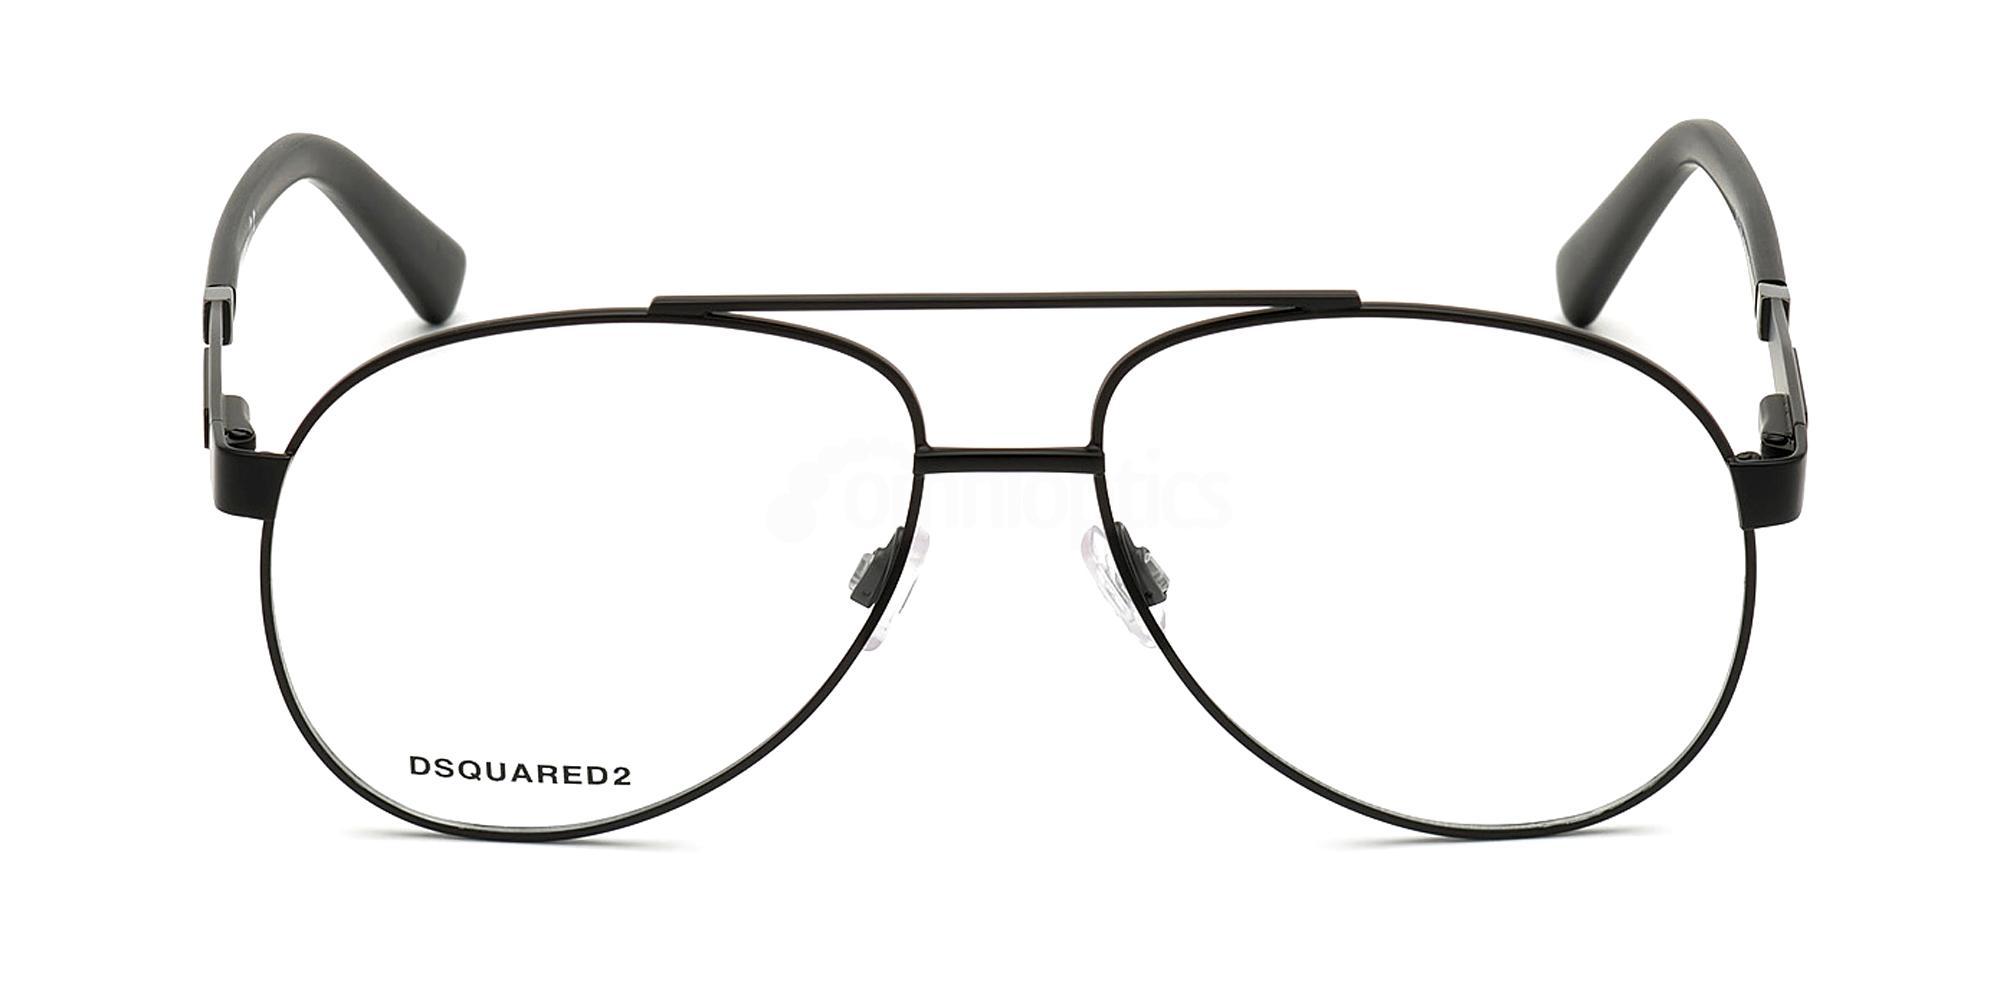 002 DQ5308 Glasses, DSQUARED2